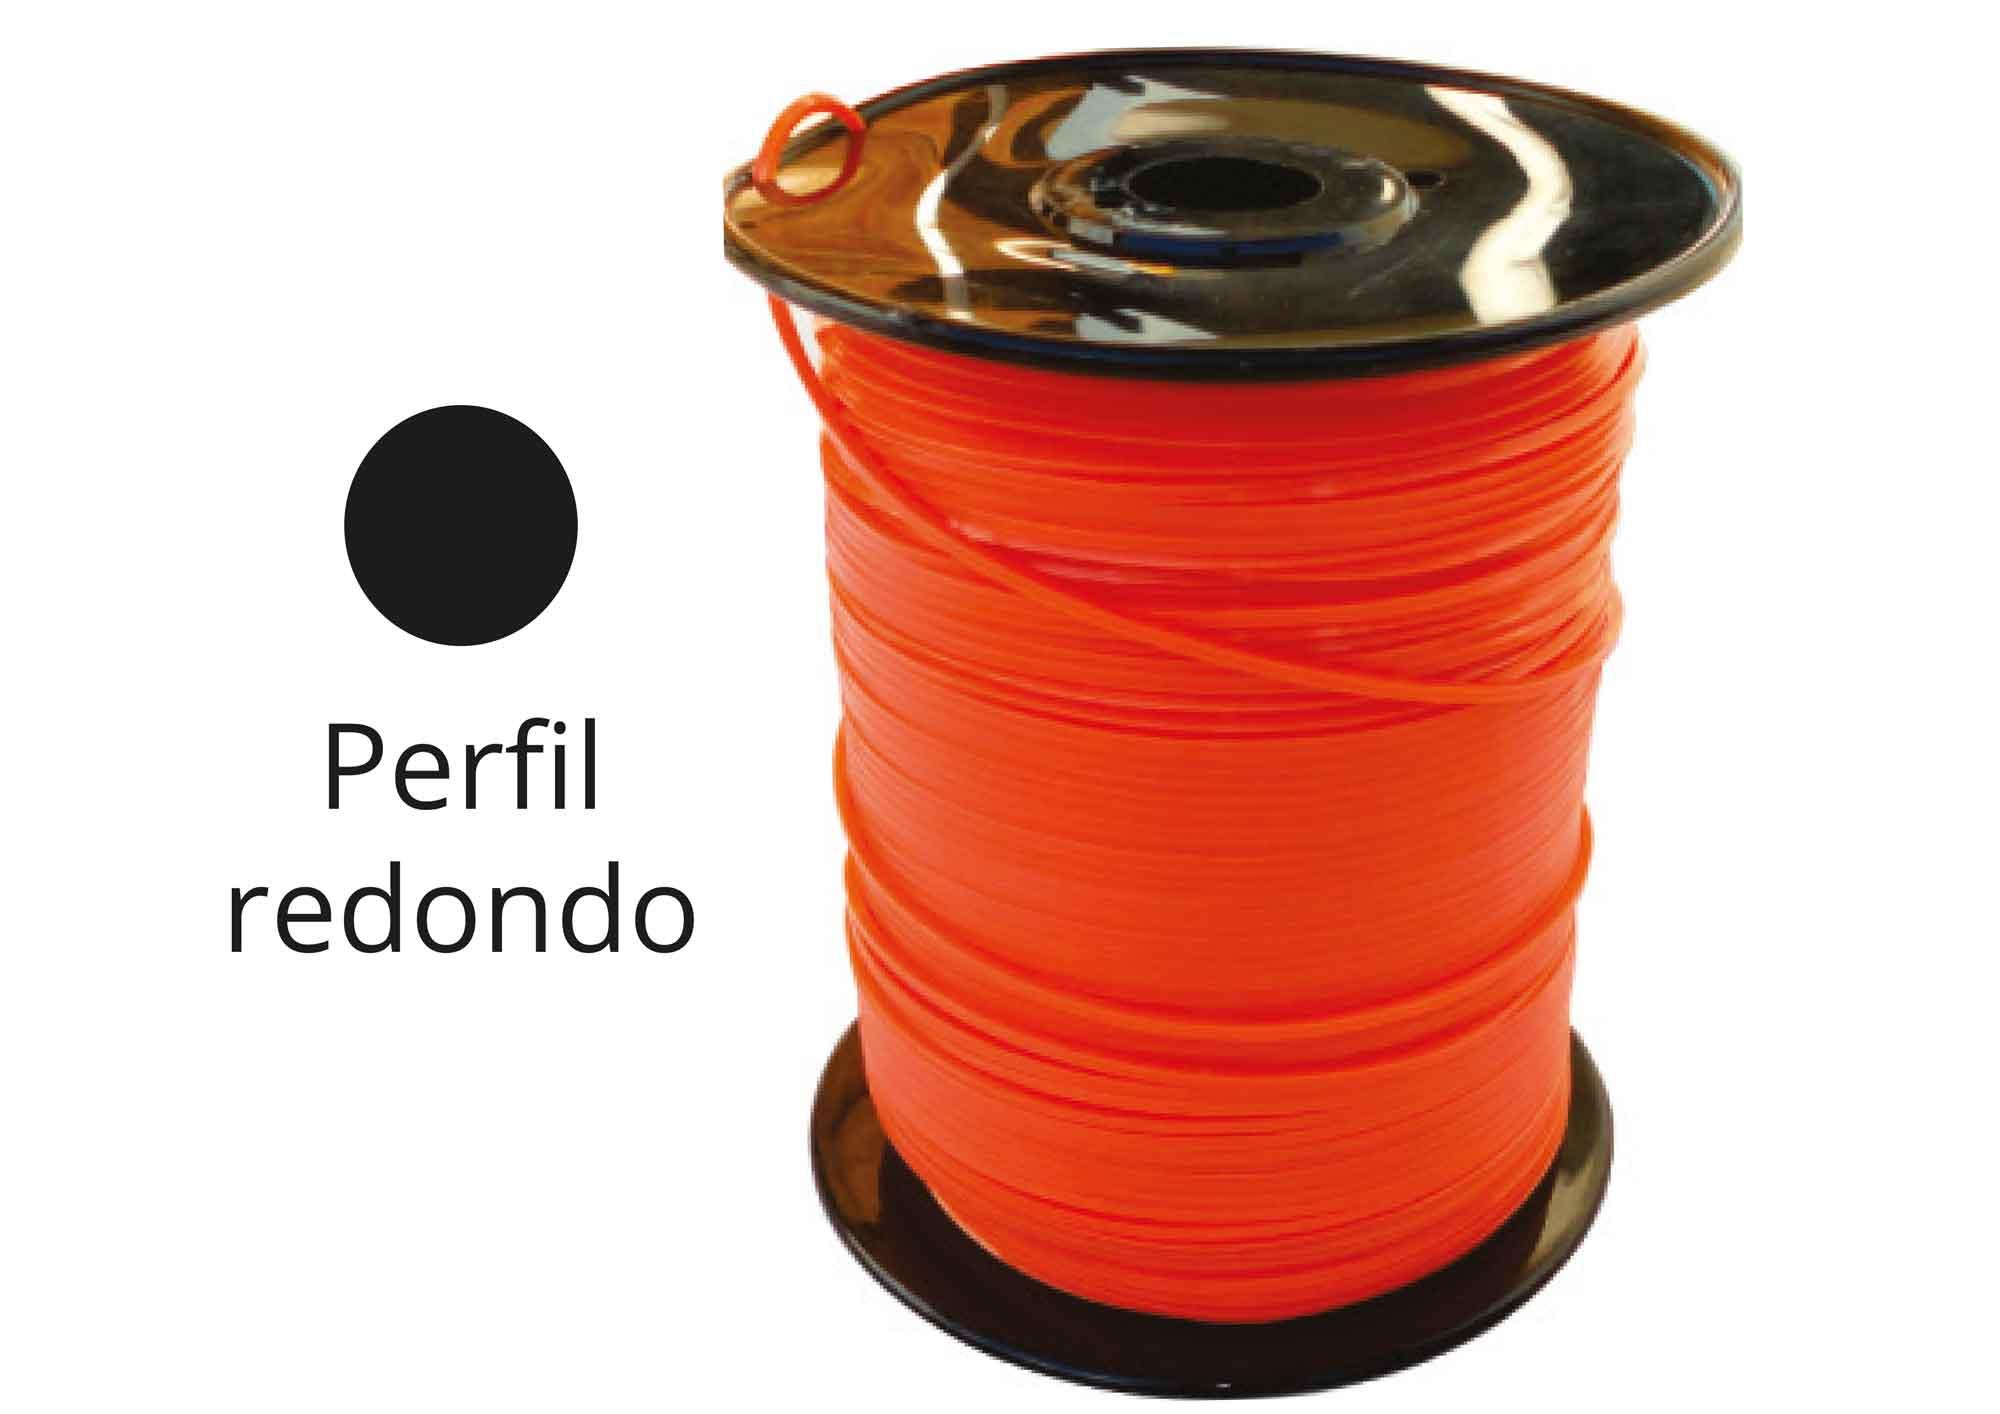 FIO NYLON REDO 1.8MM - 2 KG/ 690 MTS